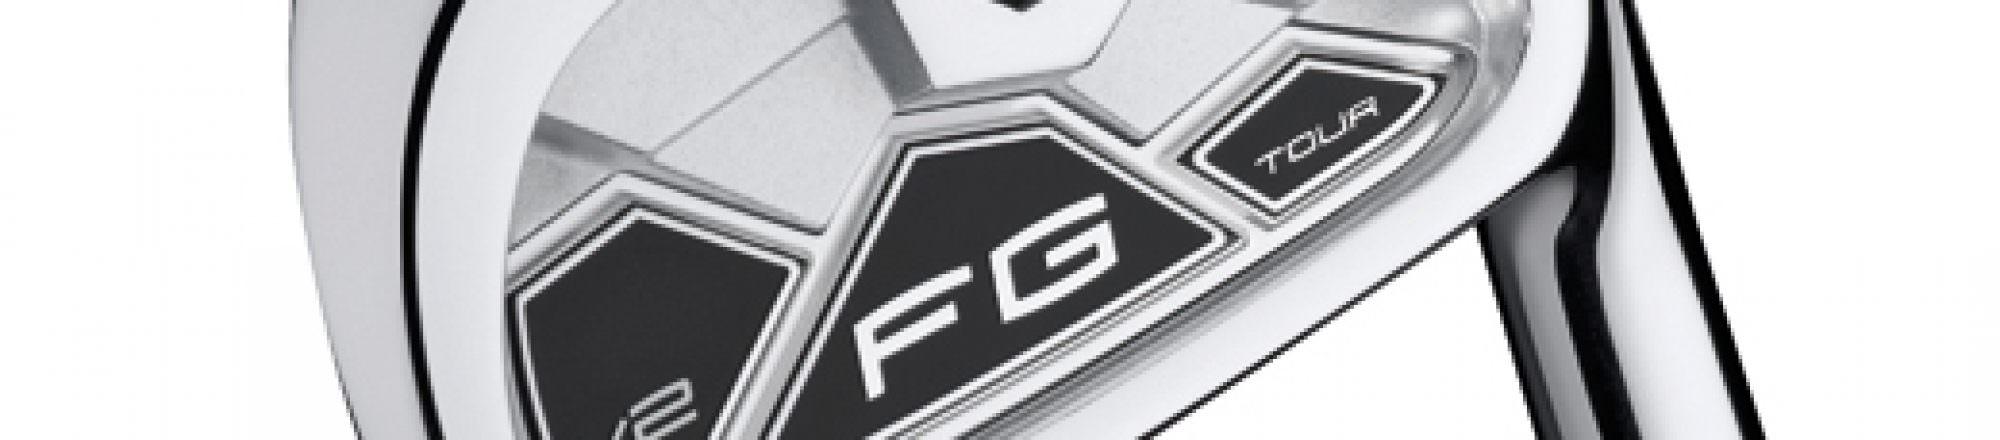 Wilson Staff: FG V2 Irons